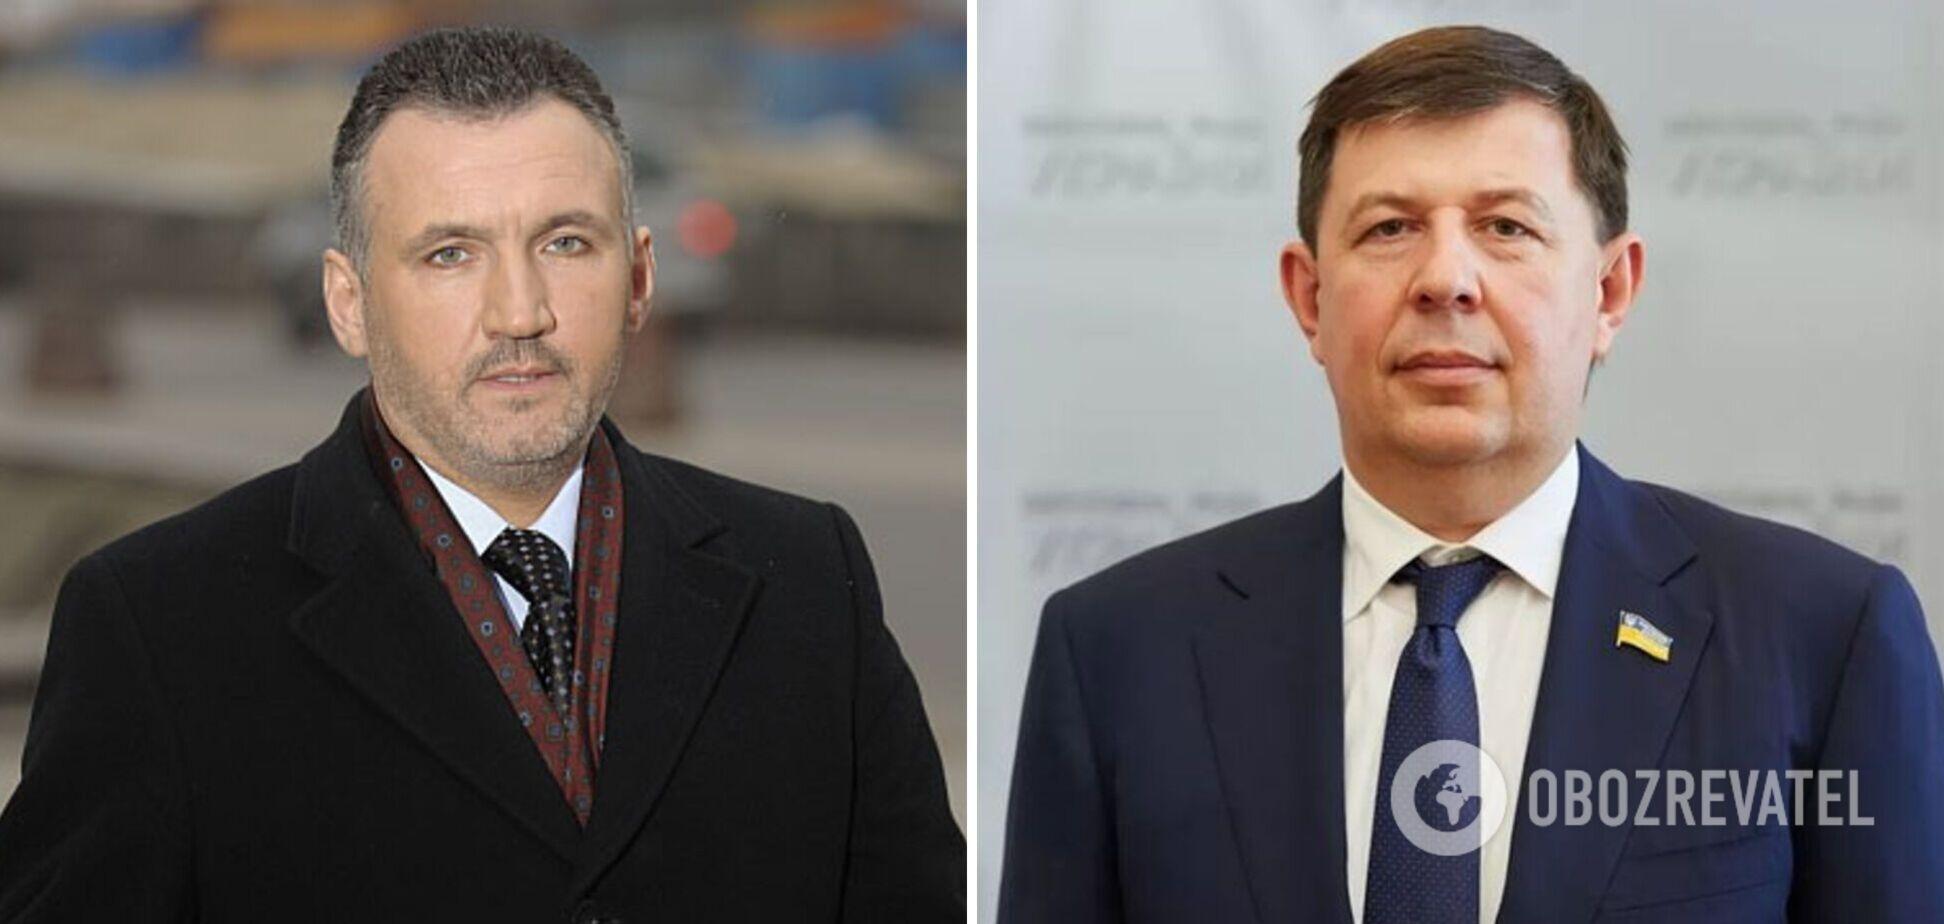 Нардепы от ОПЗЖ Ренат Кузьмин и Тарас Козак